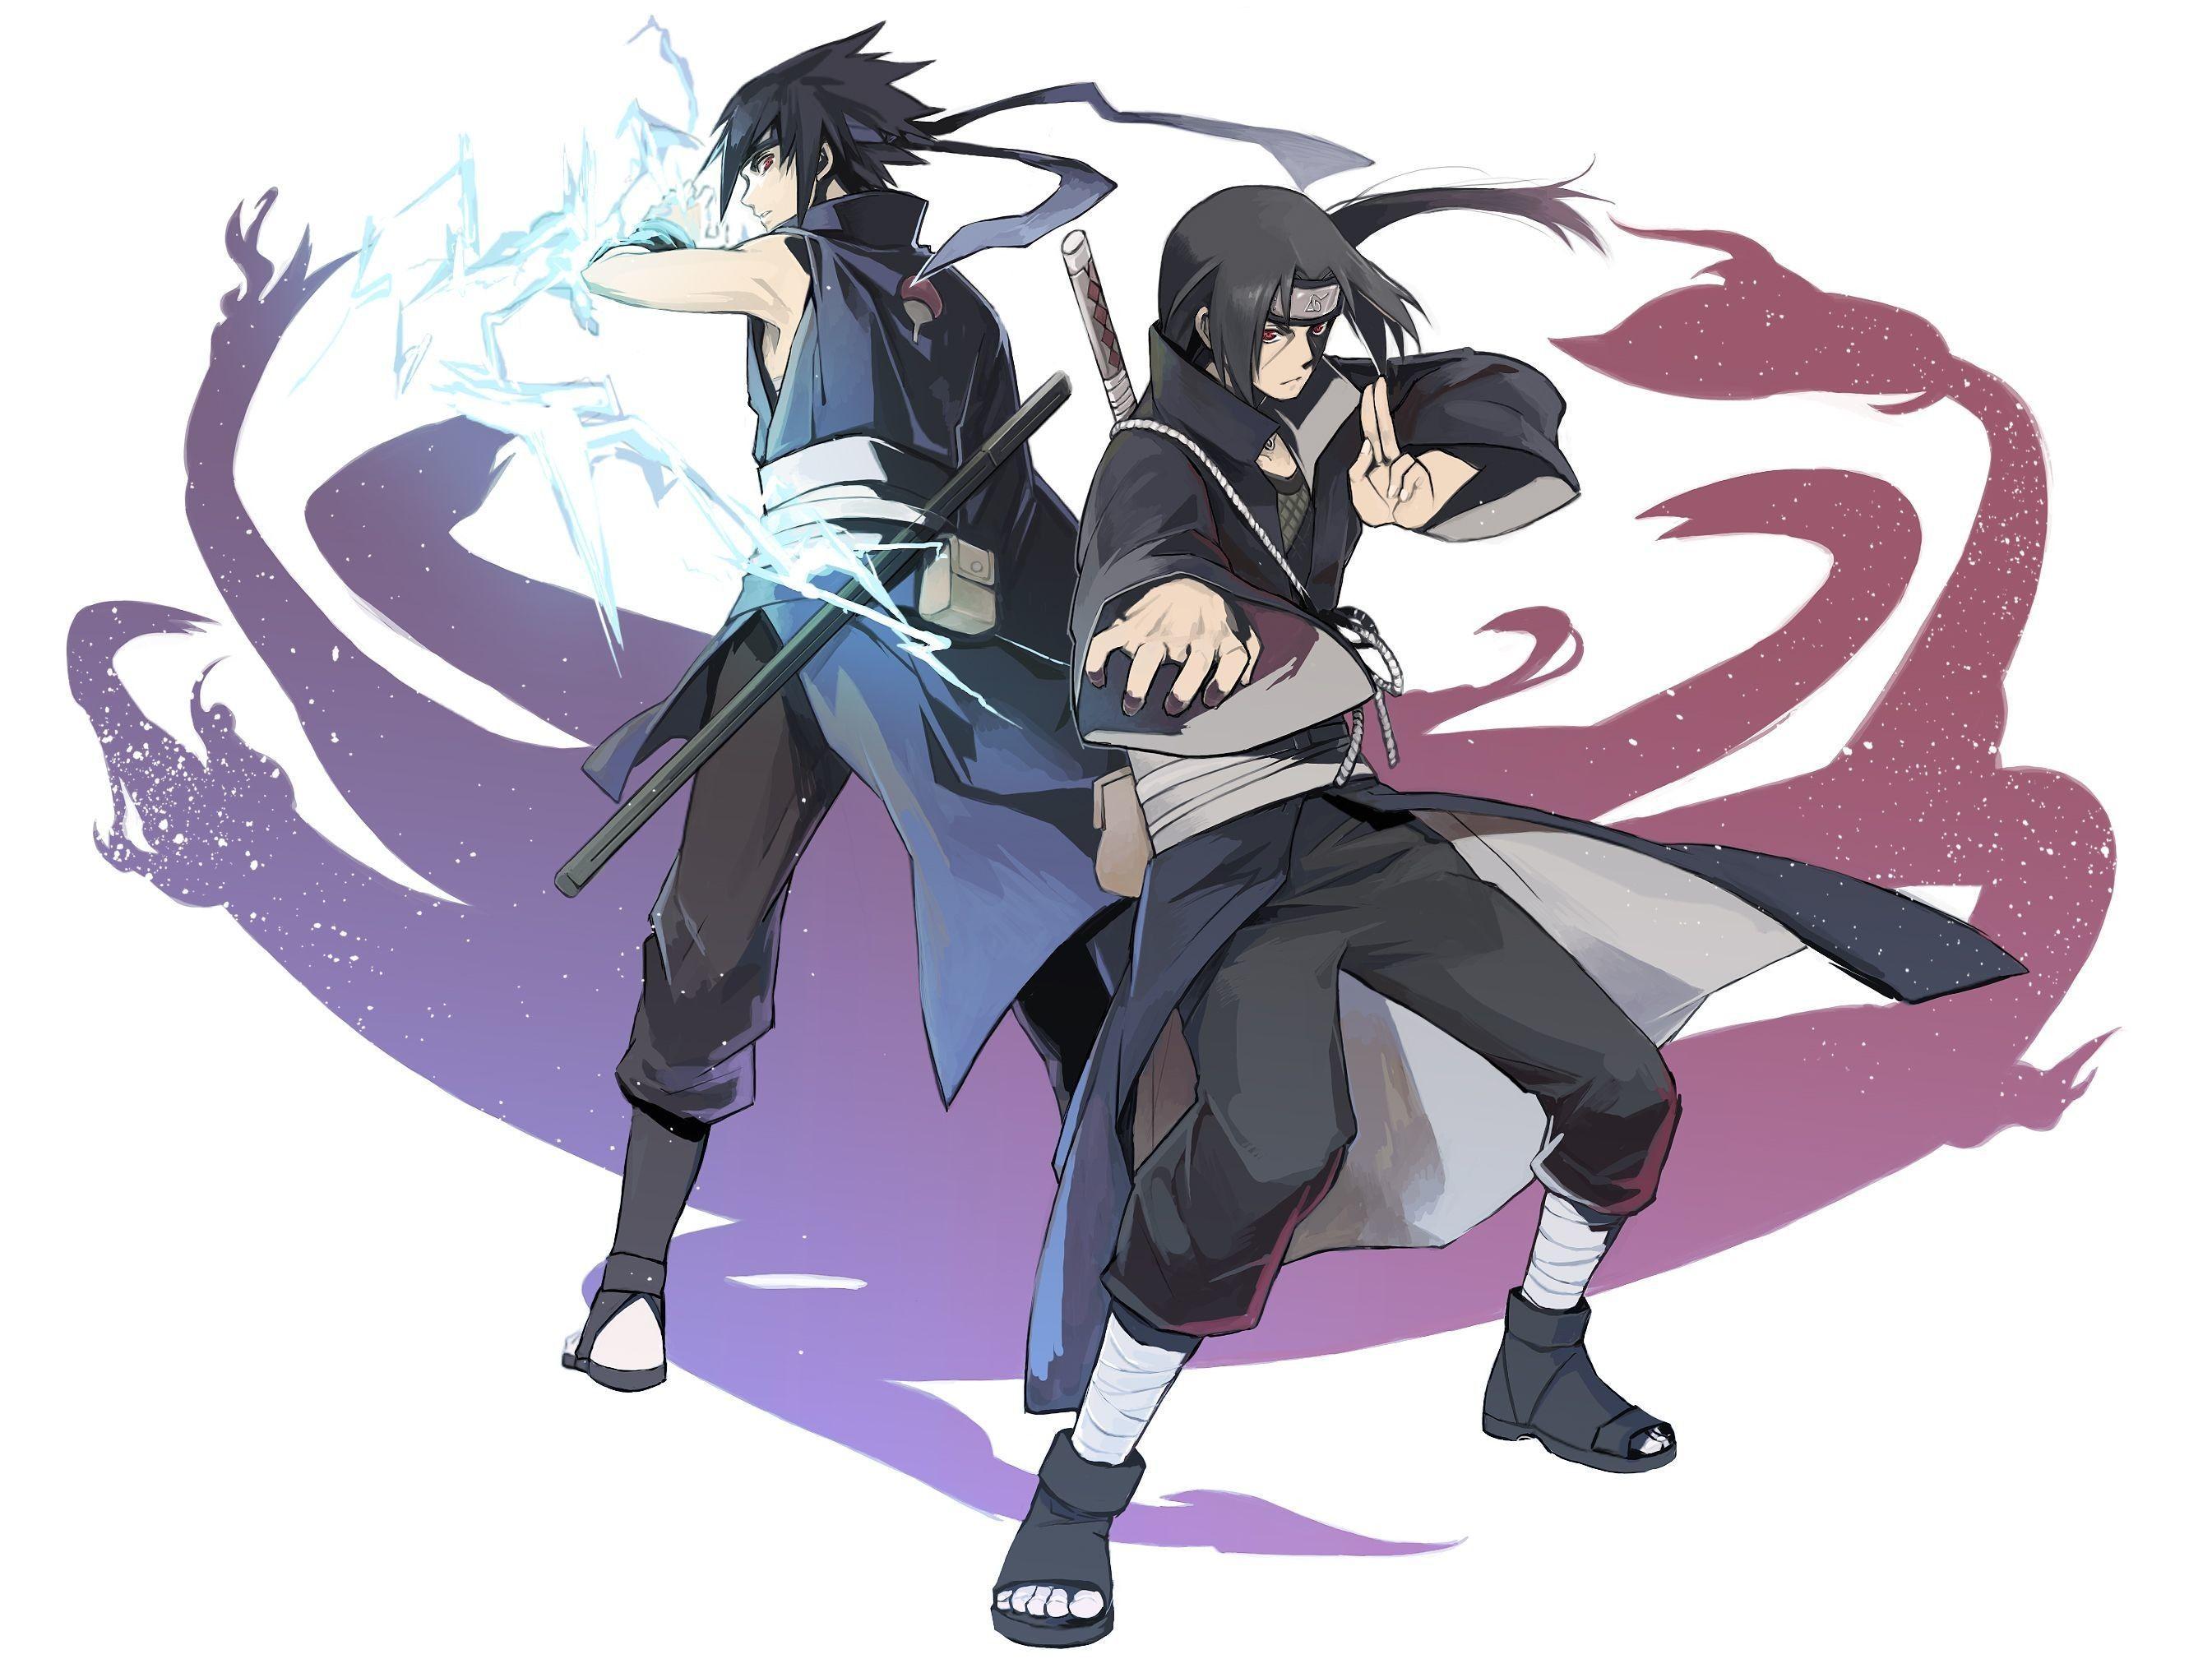 Kid Naruto Wallpapers - Top Free Kid Naruto Backgrounds - WallpaperAccess